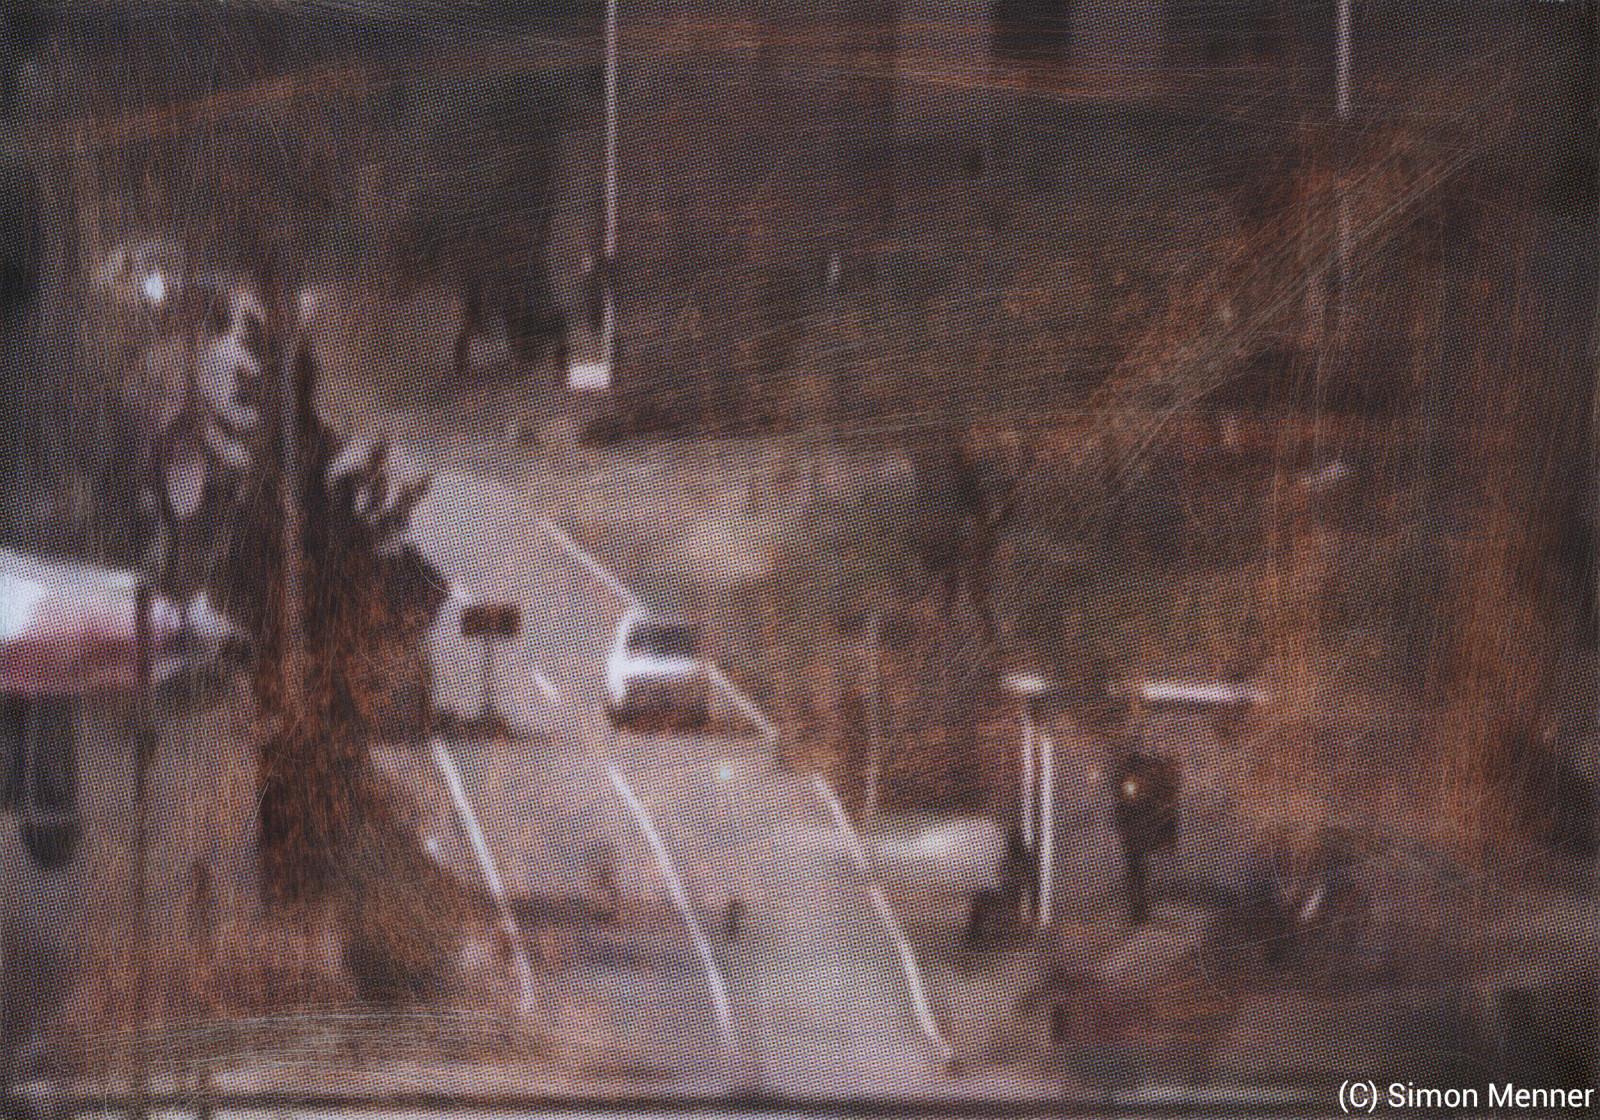 Terror Complex - Last Frame Before The Blast